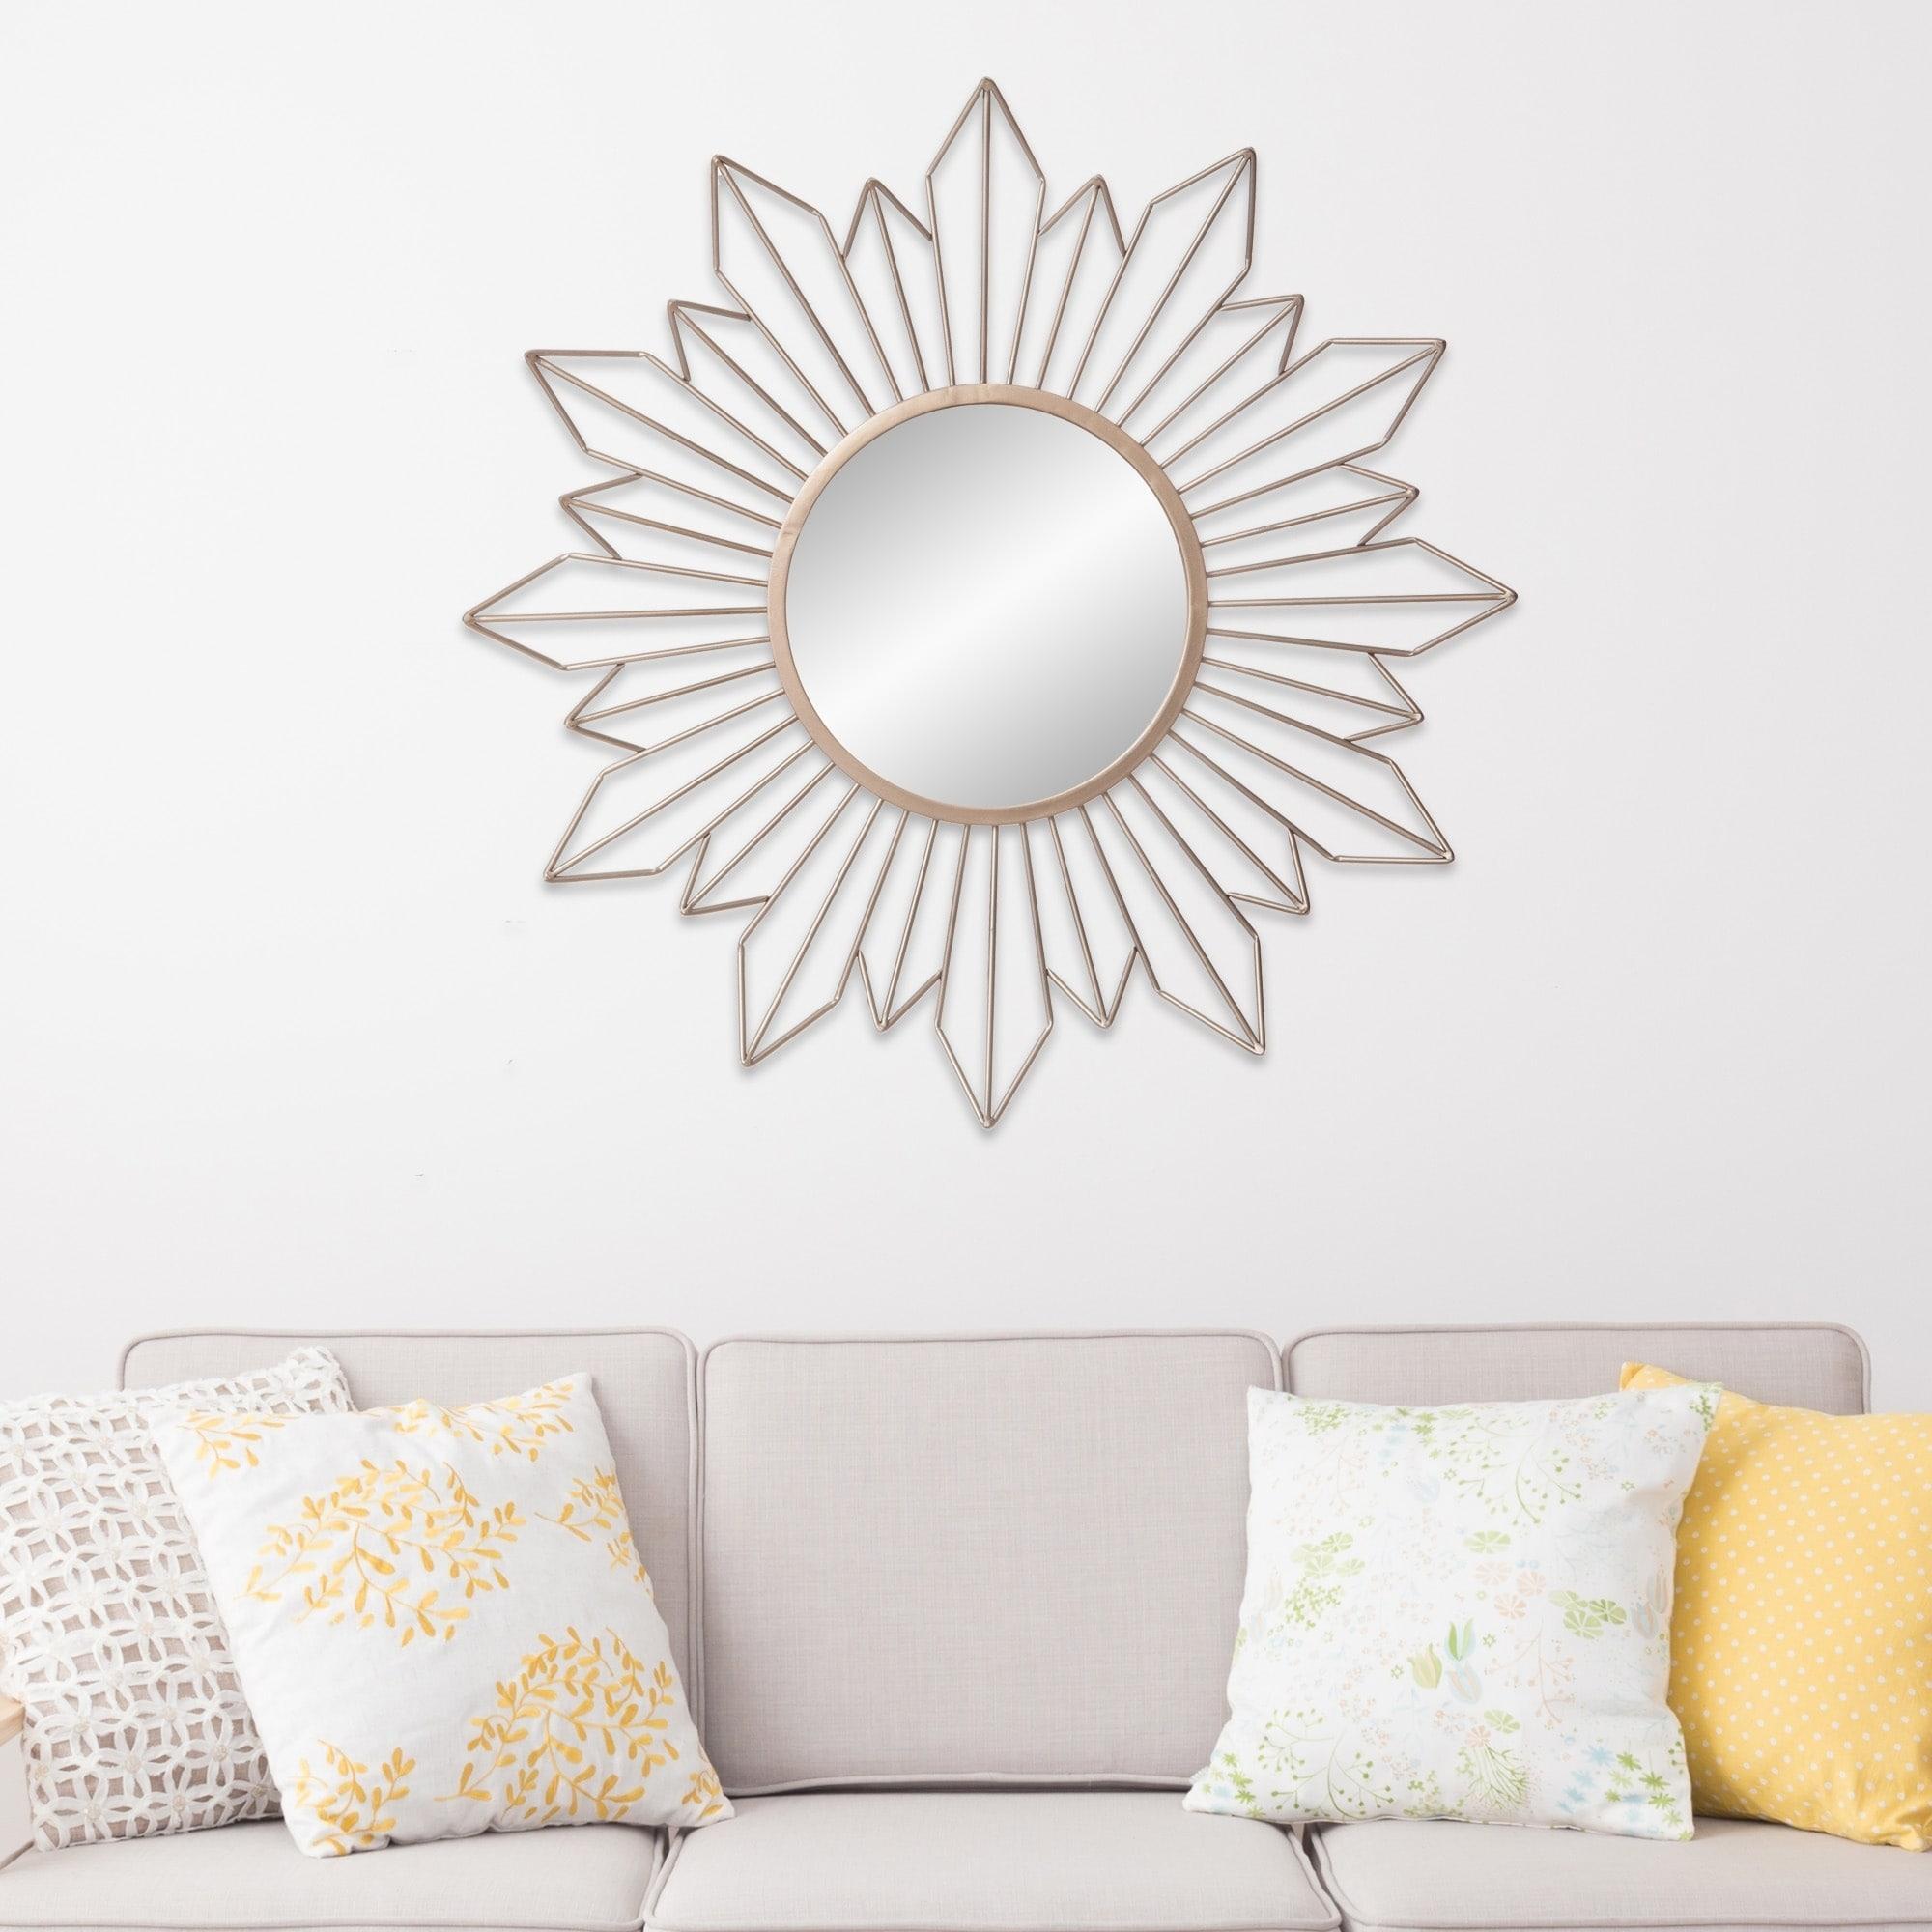 Mirrors Gold Sunburst Wall Accent Mirror Hallway Furniture ...